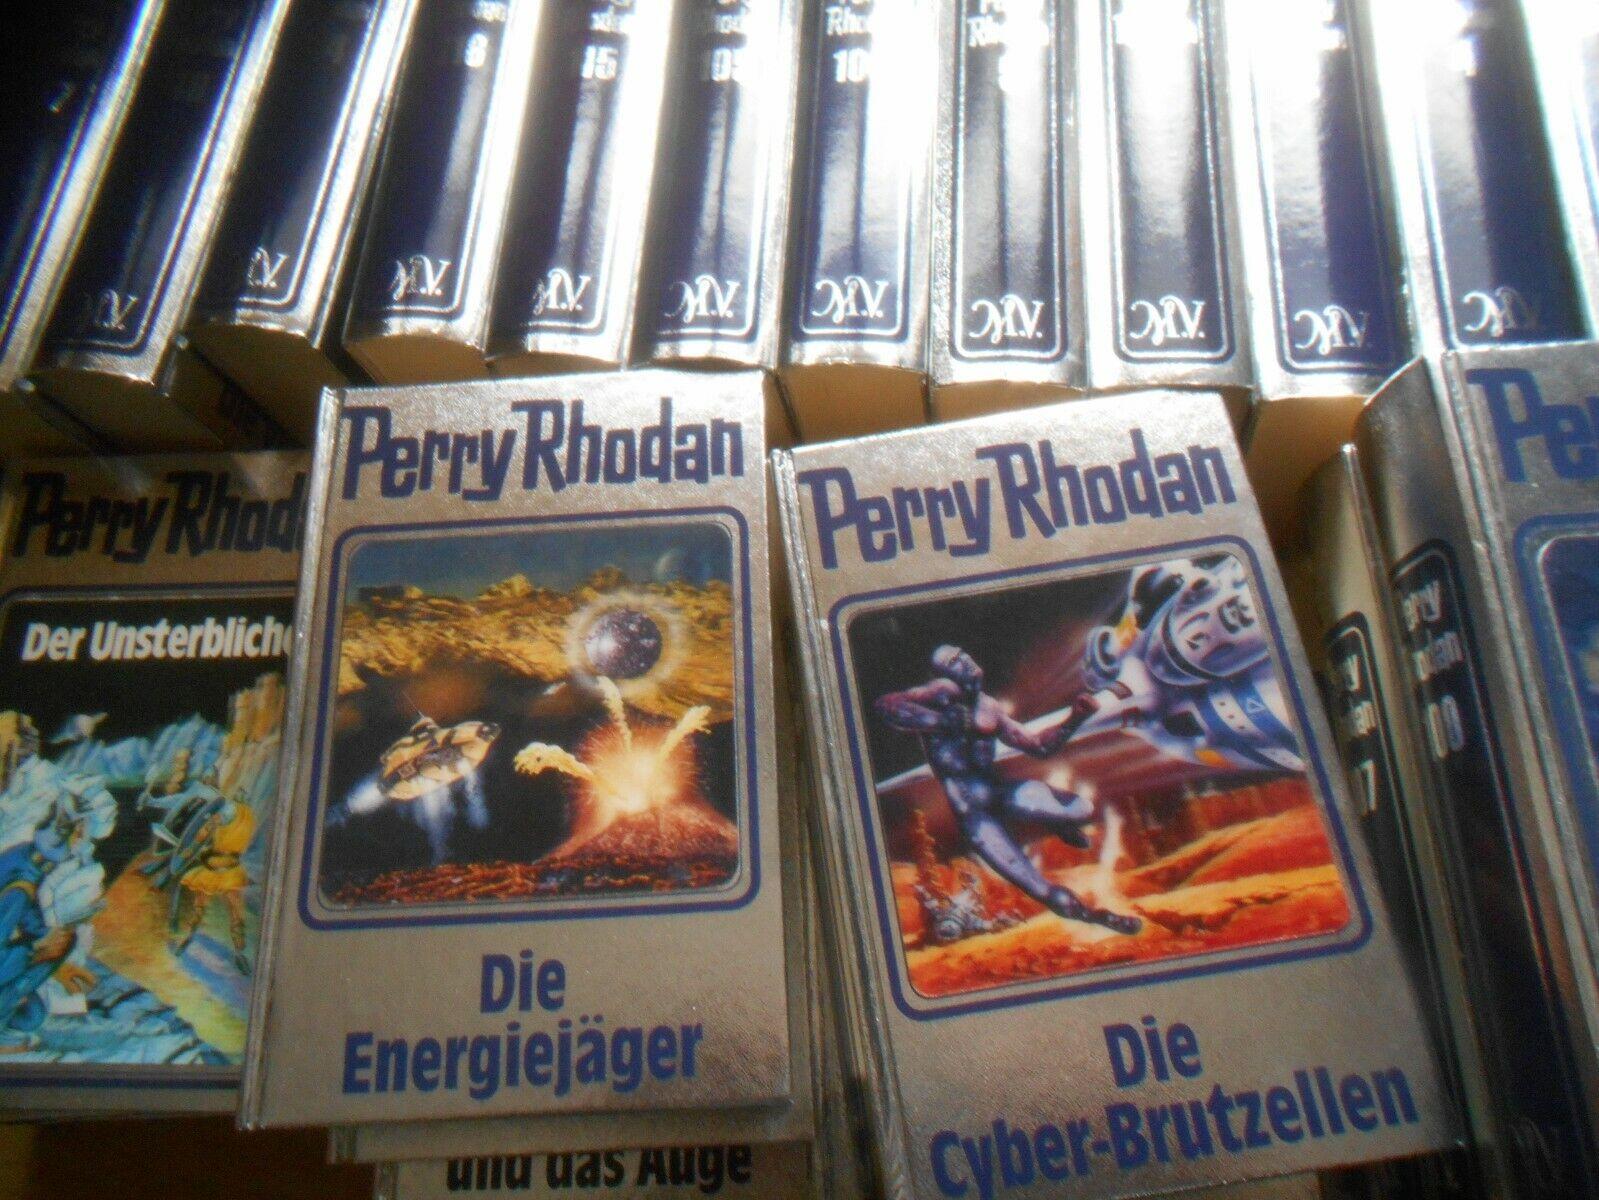 Perry Rhodan Silberband SAMMLUNG Science Fiction Klassiker Hardcover Hologramm